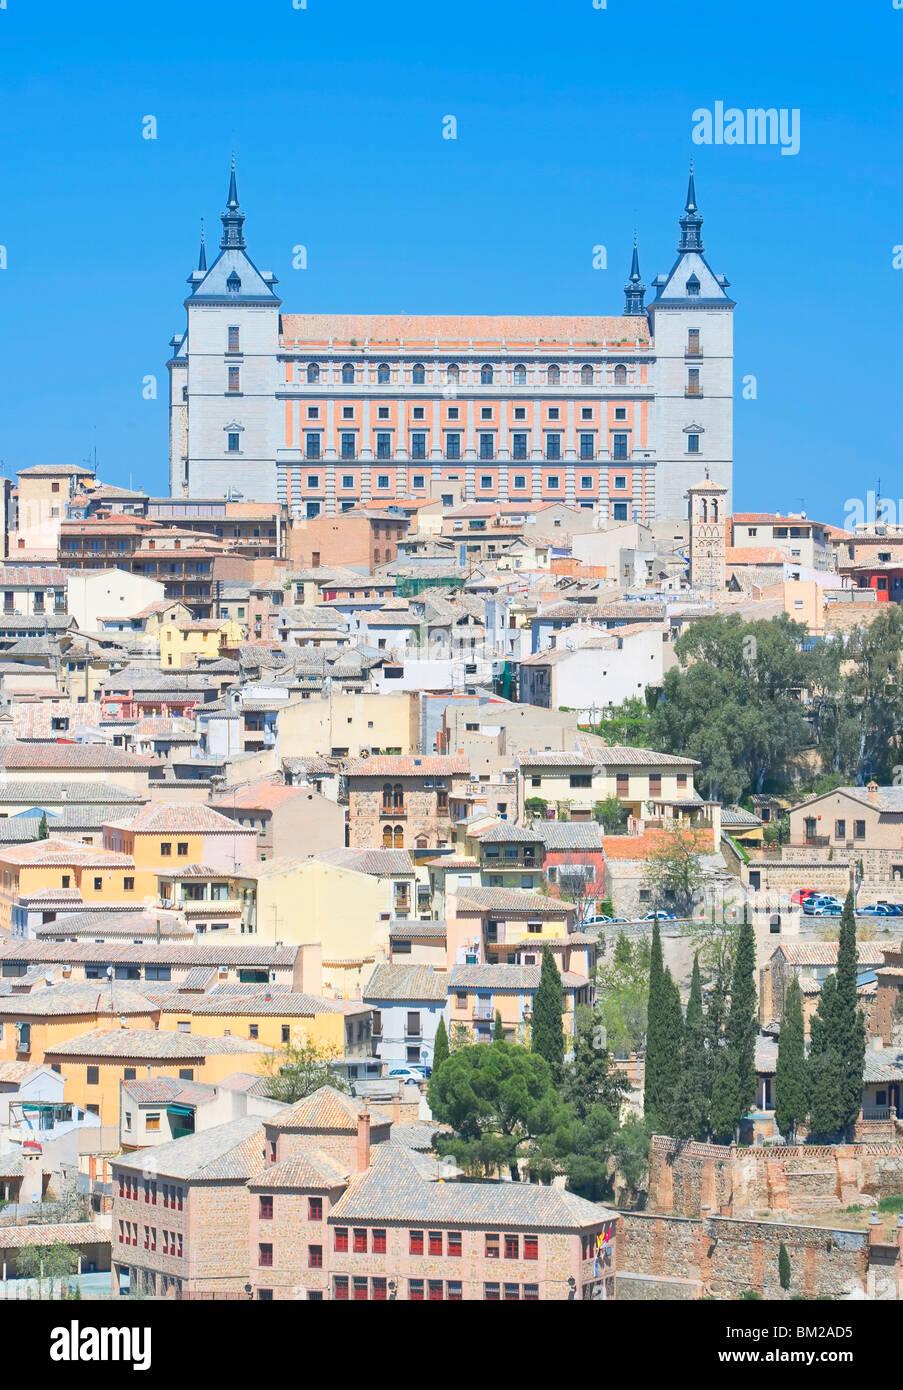 Toledo Stadtbild, Toledo, UNESCO-Weltkulturerbe, Castilla La Mancha, Spanien Stockbild